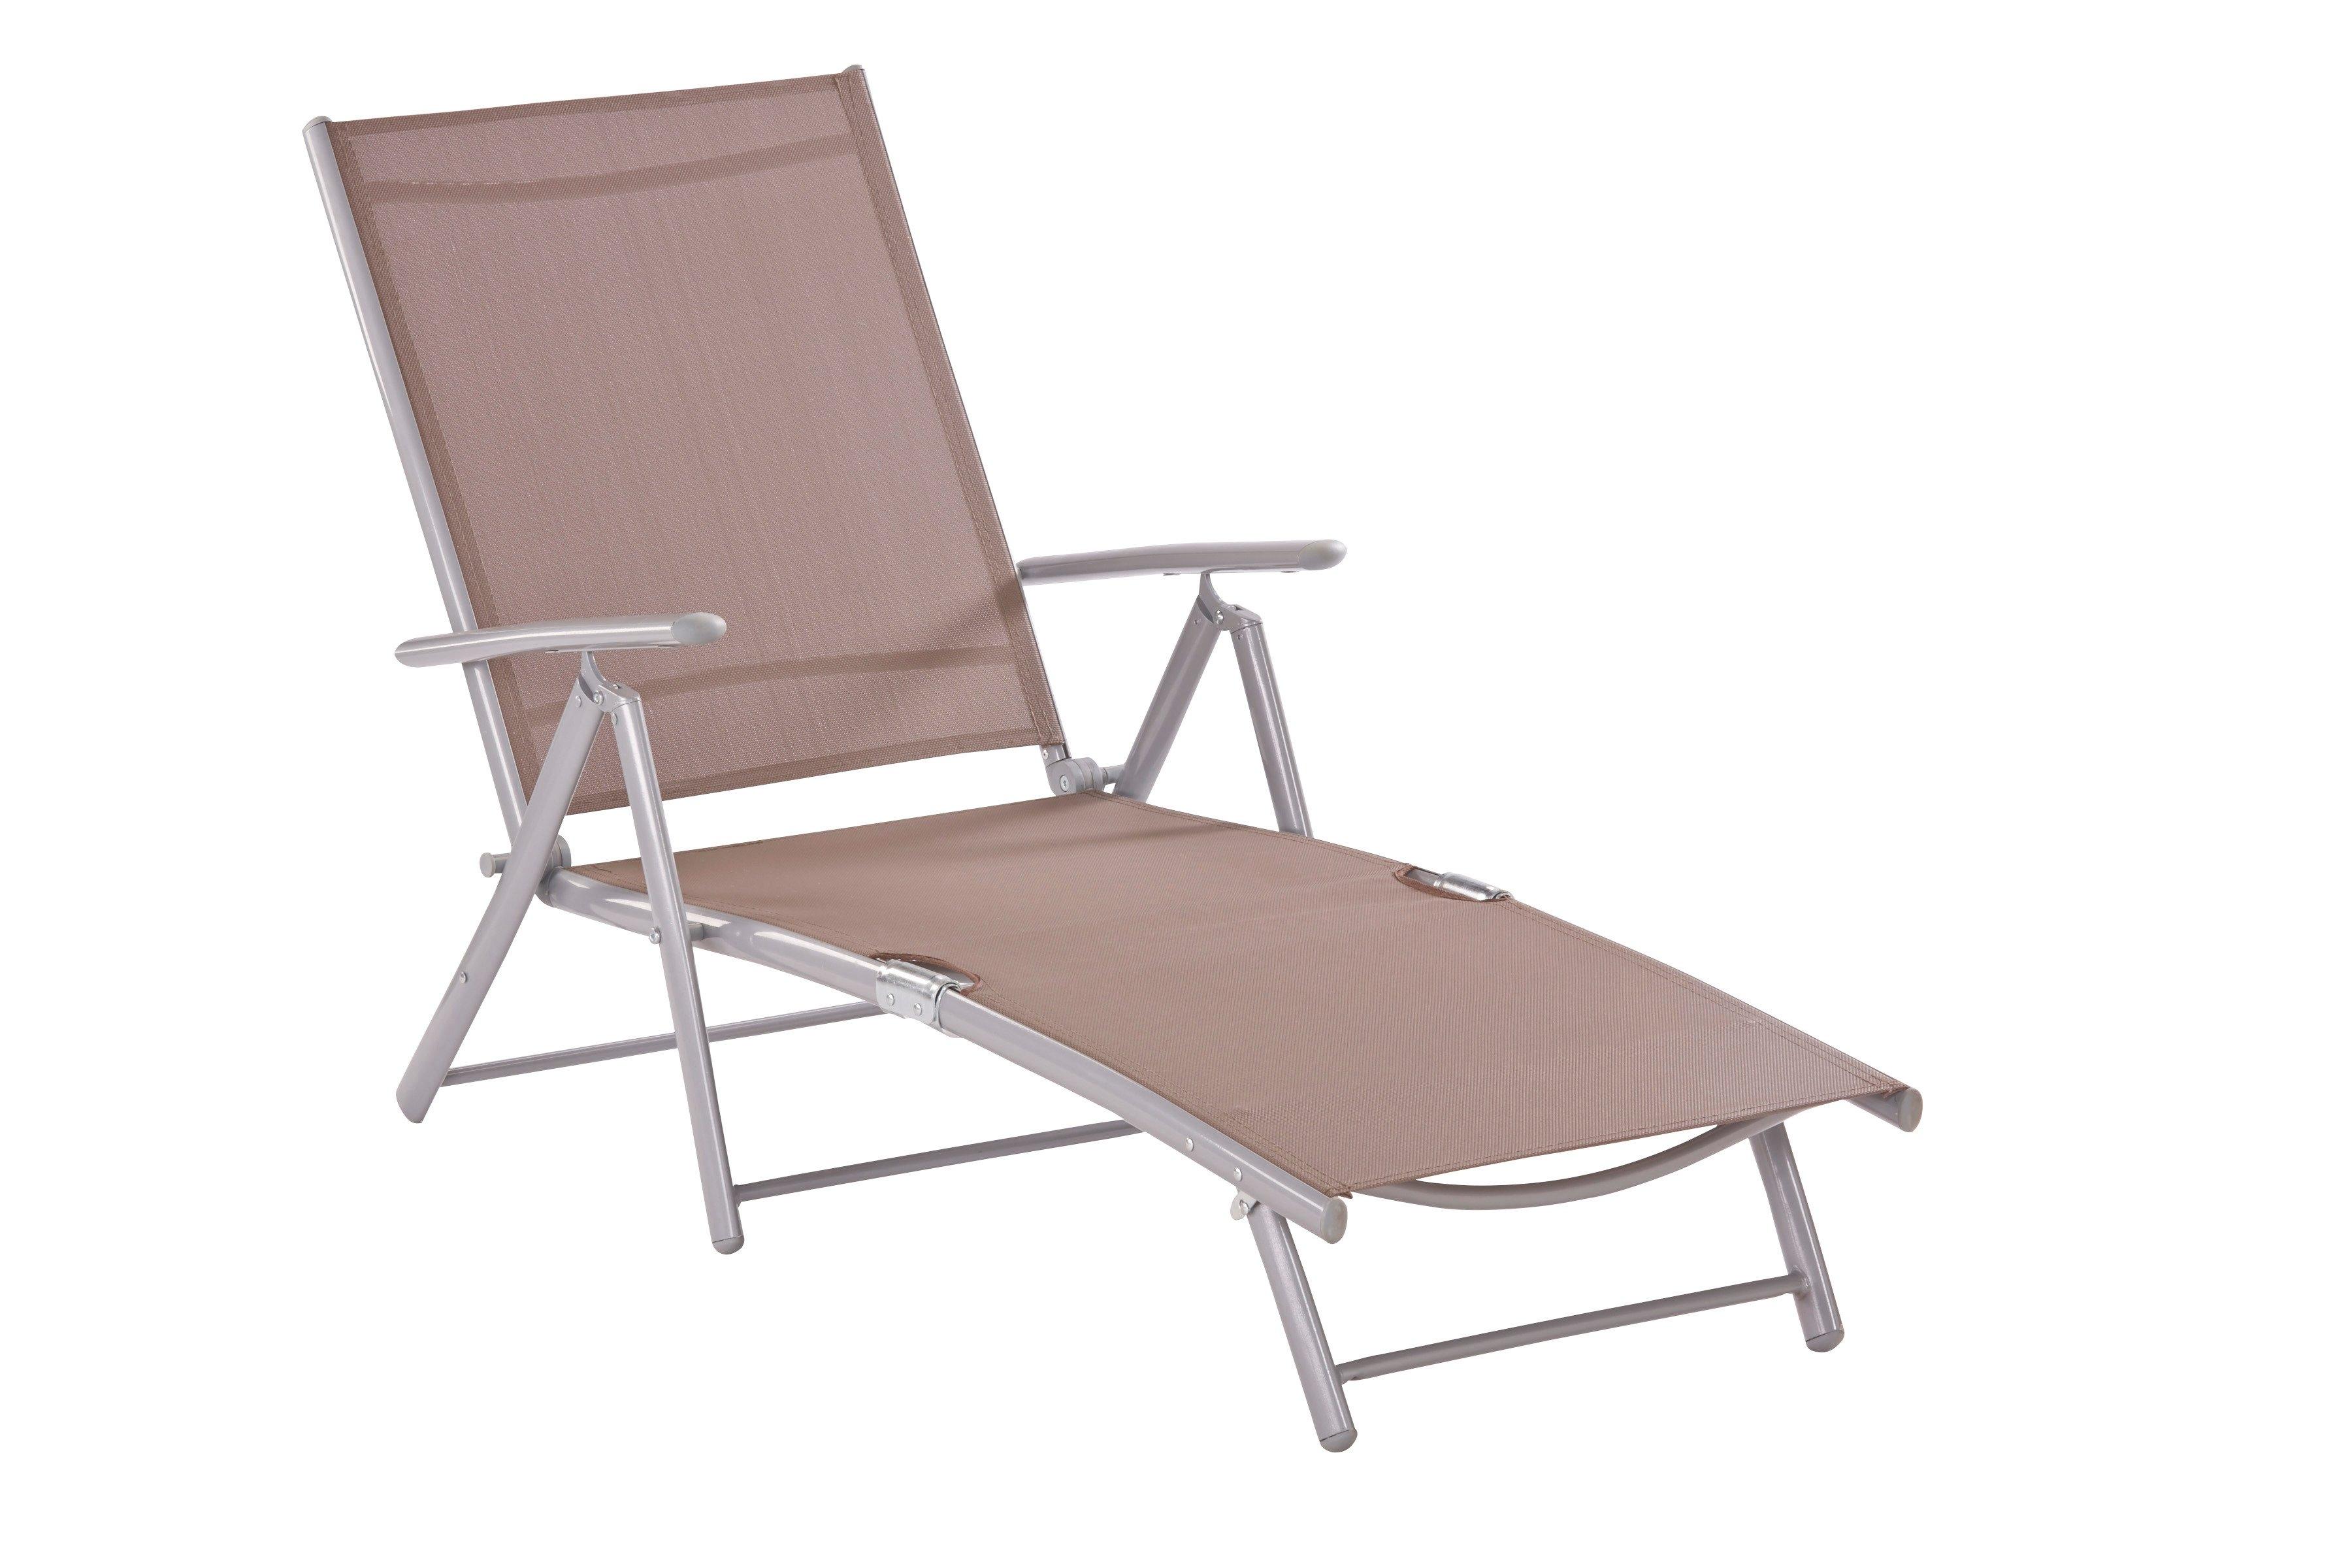 Ligstoel Tuin Aluminium : Merxx ligstoel alu textiel opvouwbaar snel online gekocht otto